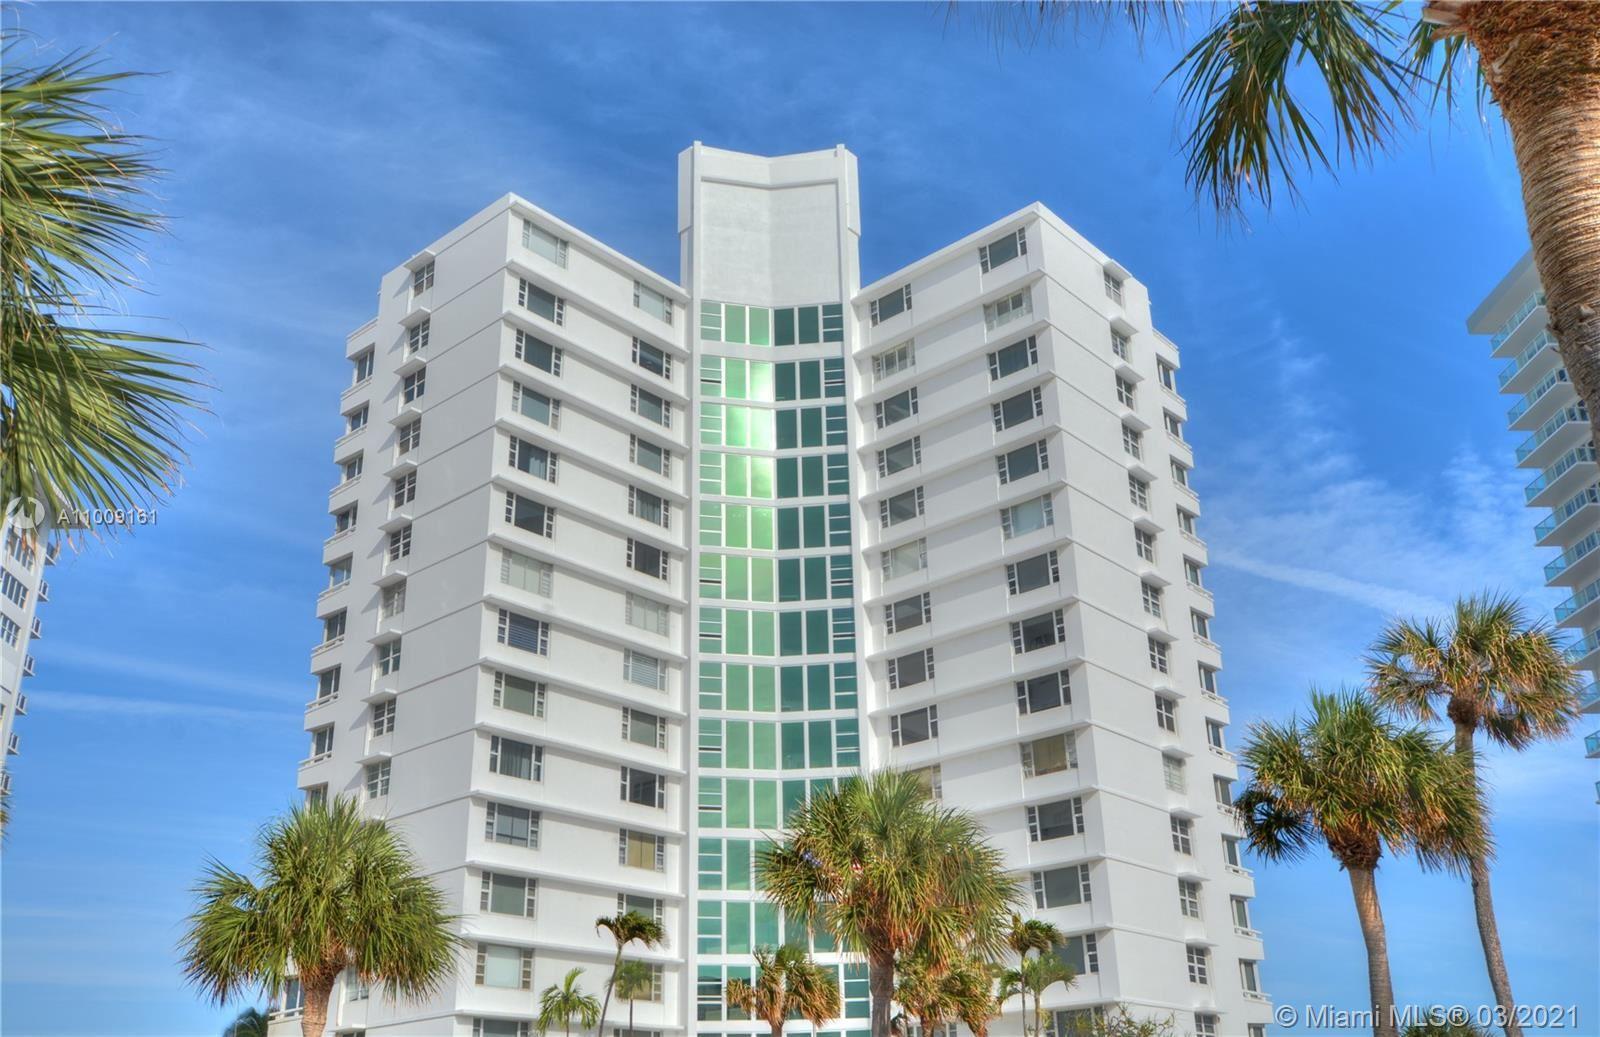 Photo of 3600 Galt Ocean Dr #2E, Fort Lauderdale, FL 33308 (MLS # A11009161)